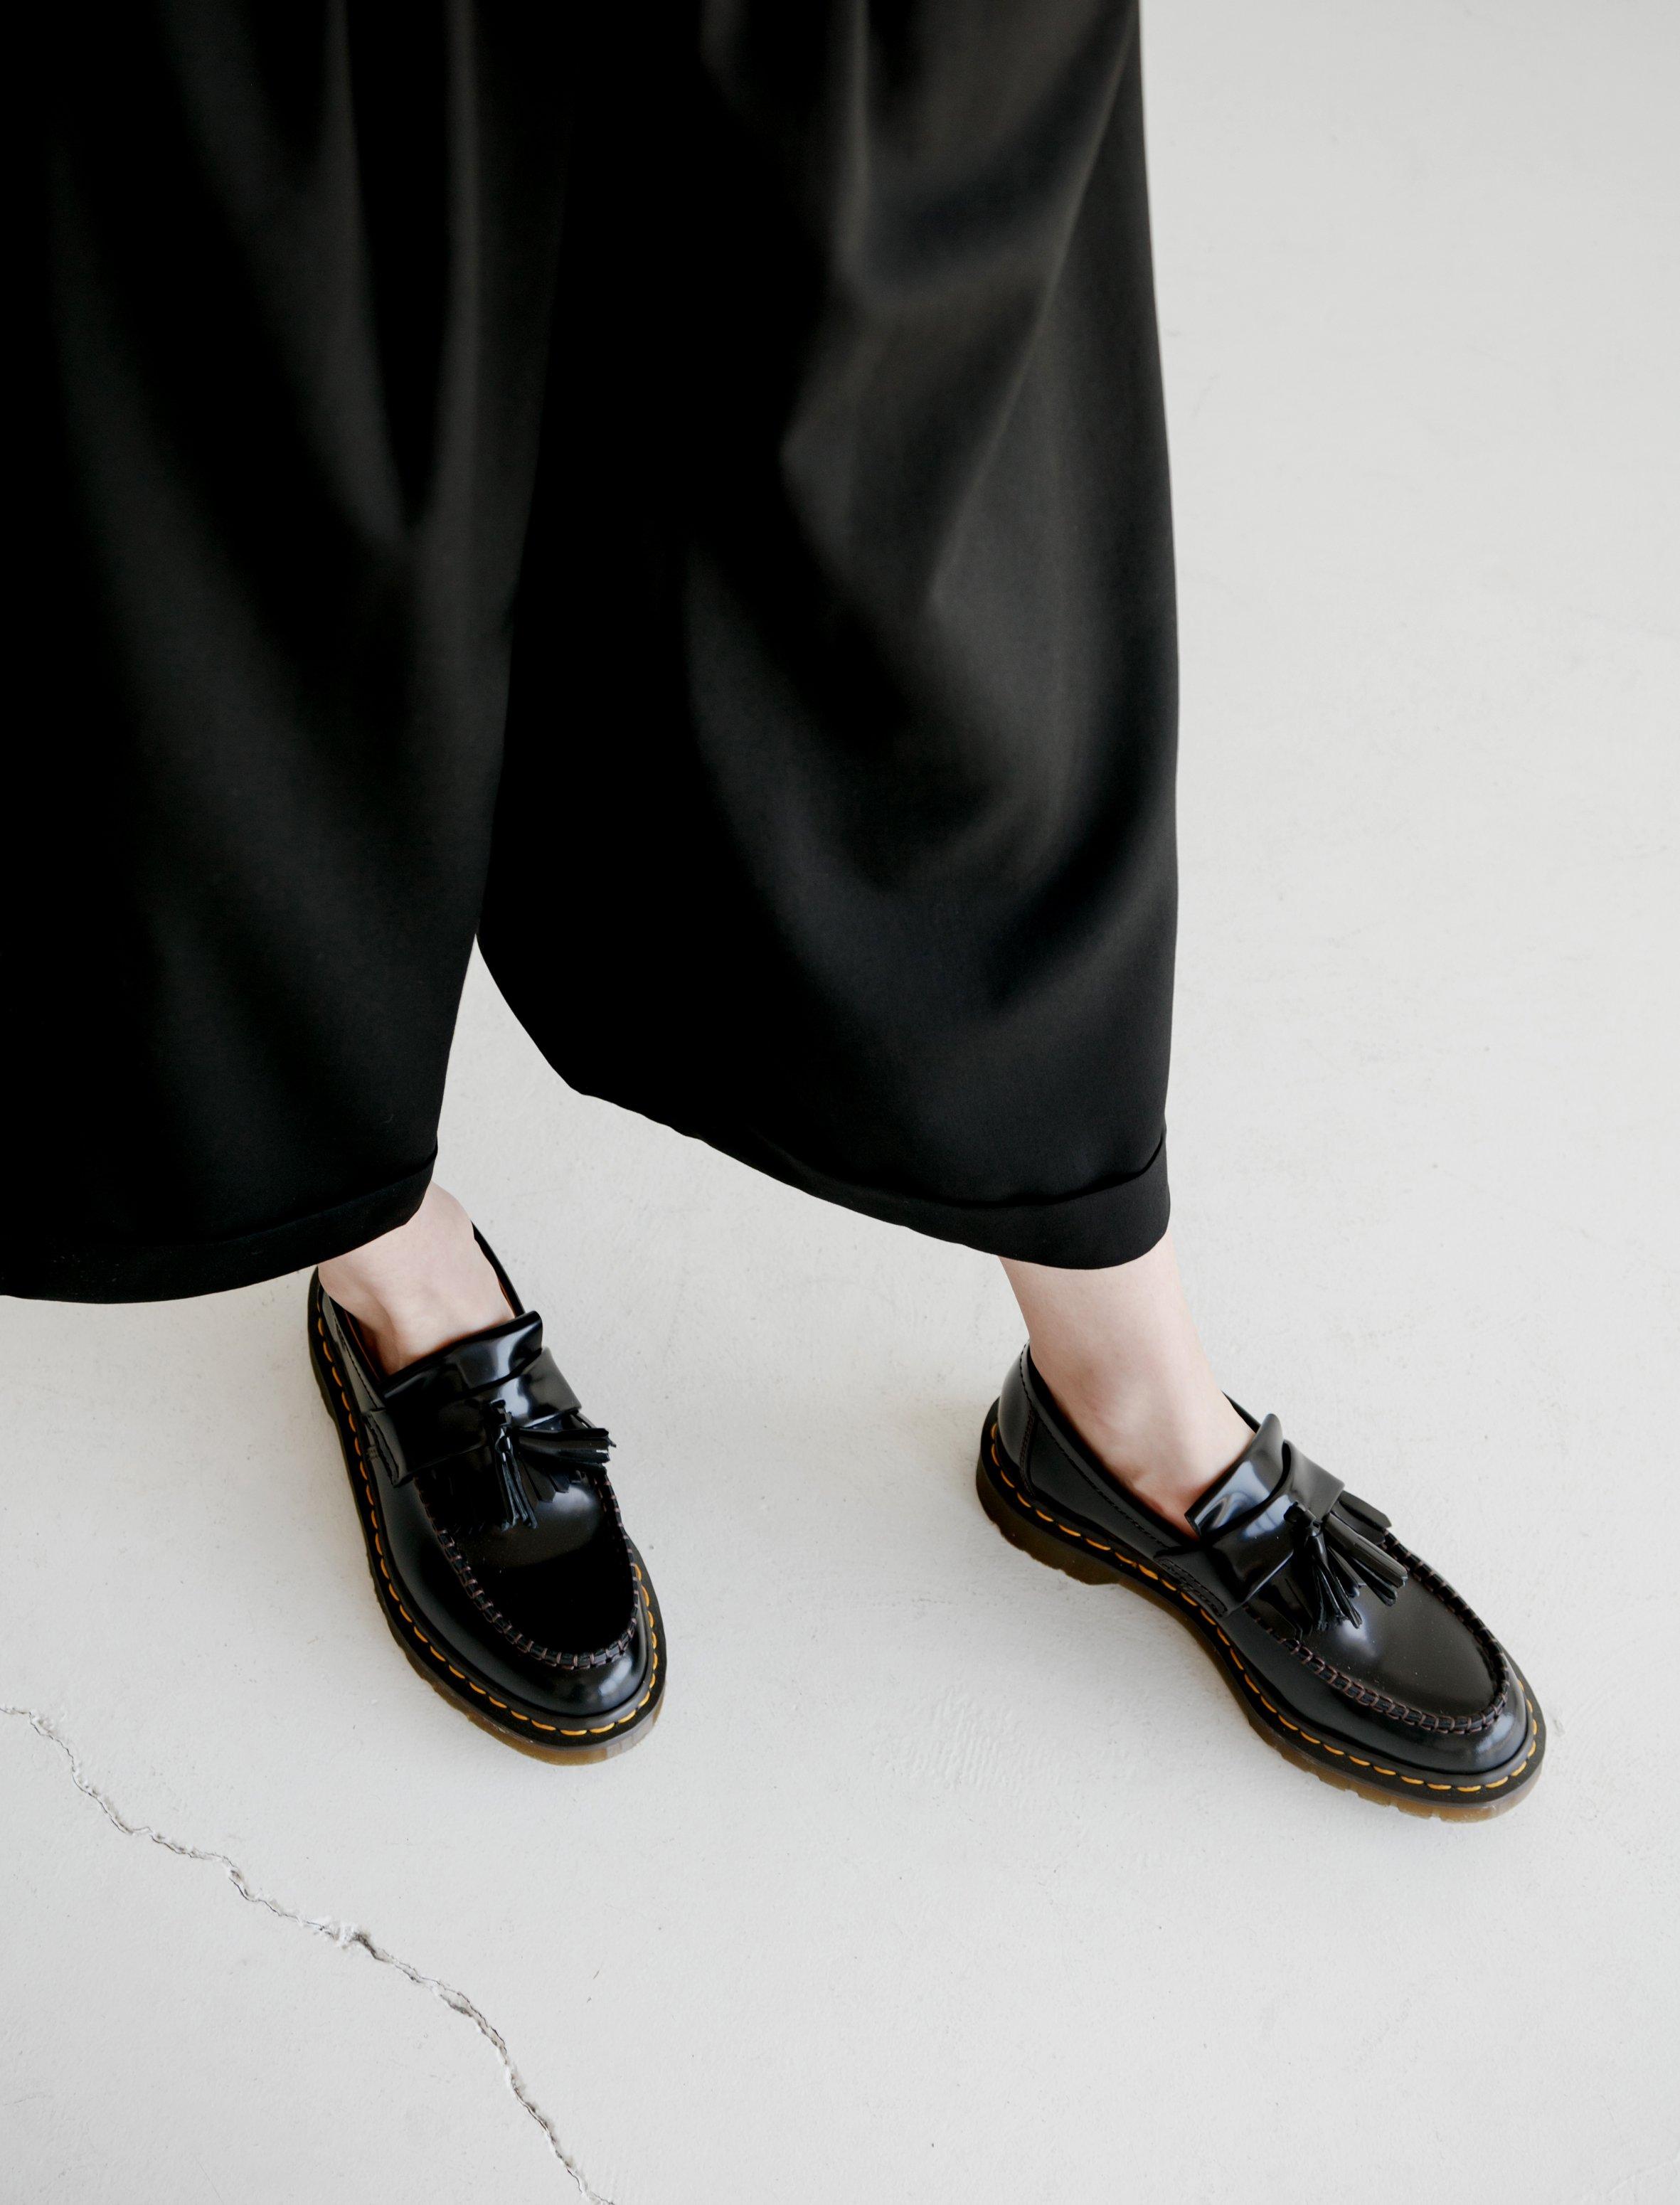 Comme Des Garçons Dr Martens Adrian Tassel Loafers Black Garmentory